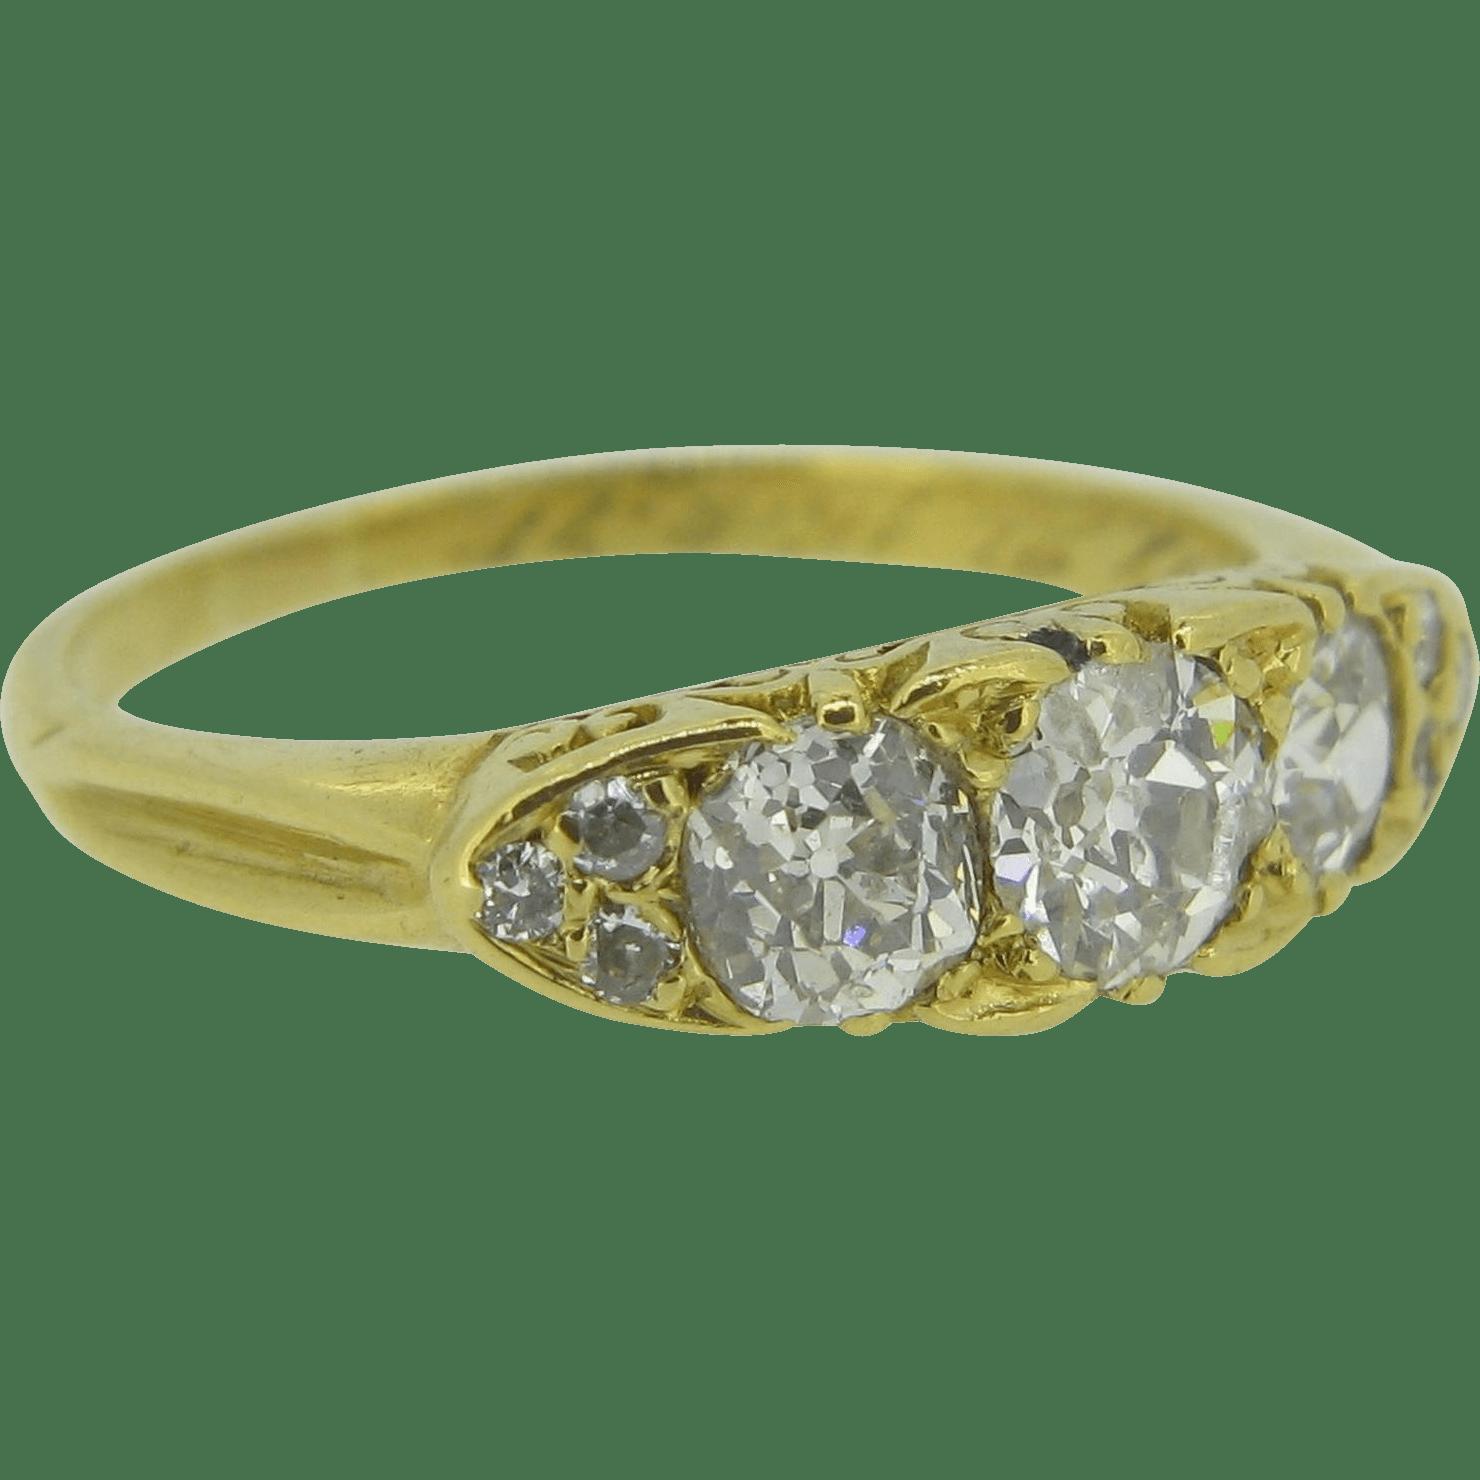 Victorian diamonds ring 18 karat yellow gold from heritagem on Ruby Lane